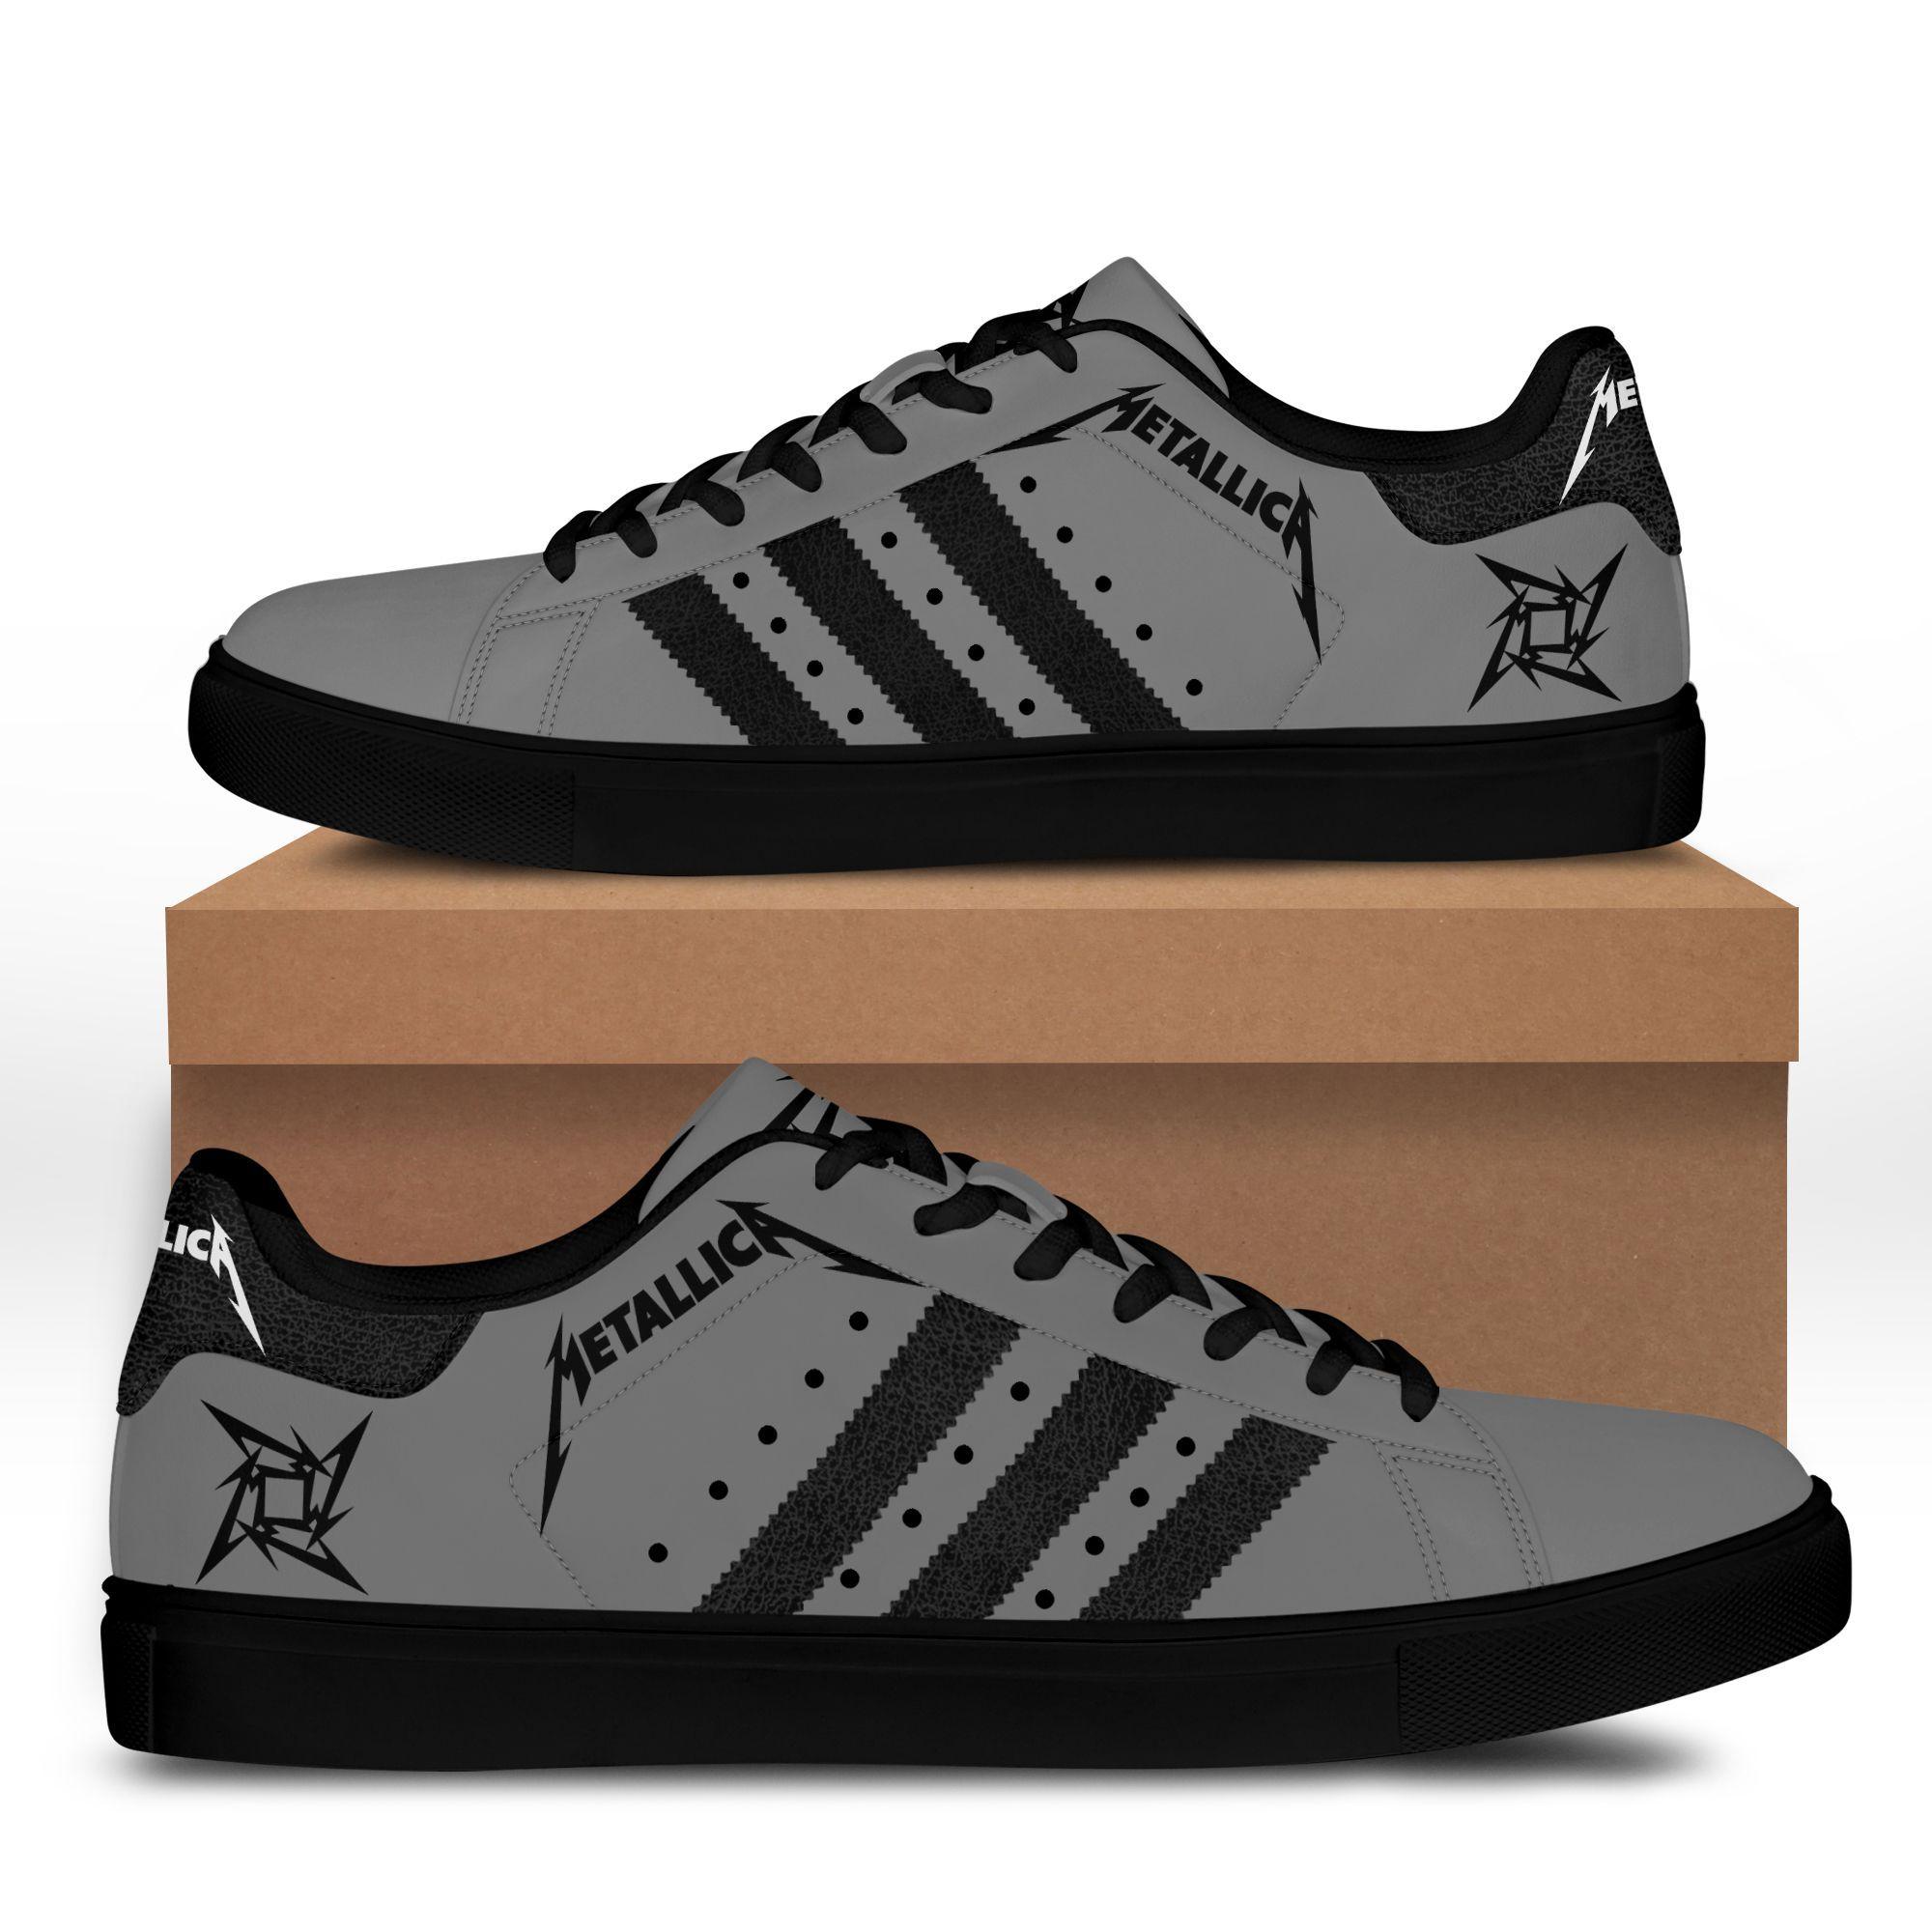 Metallica grey version Stan Smith Sneaker